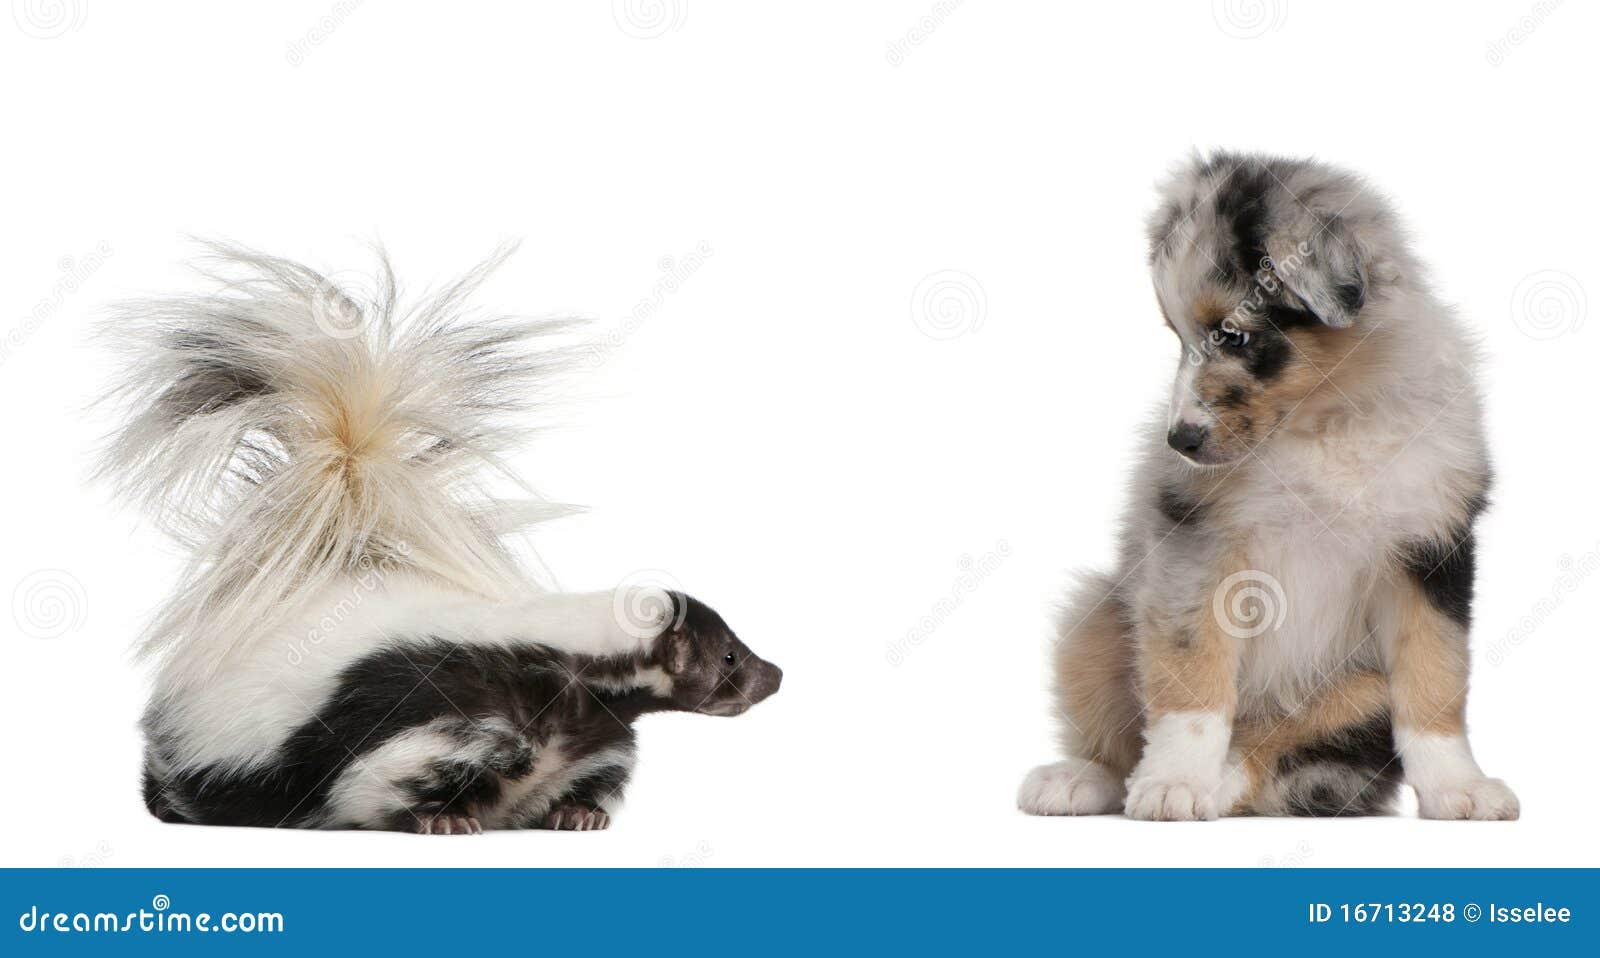 Blue Merle Australian Shepherd Puppy Stock Photo - Image of animal